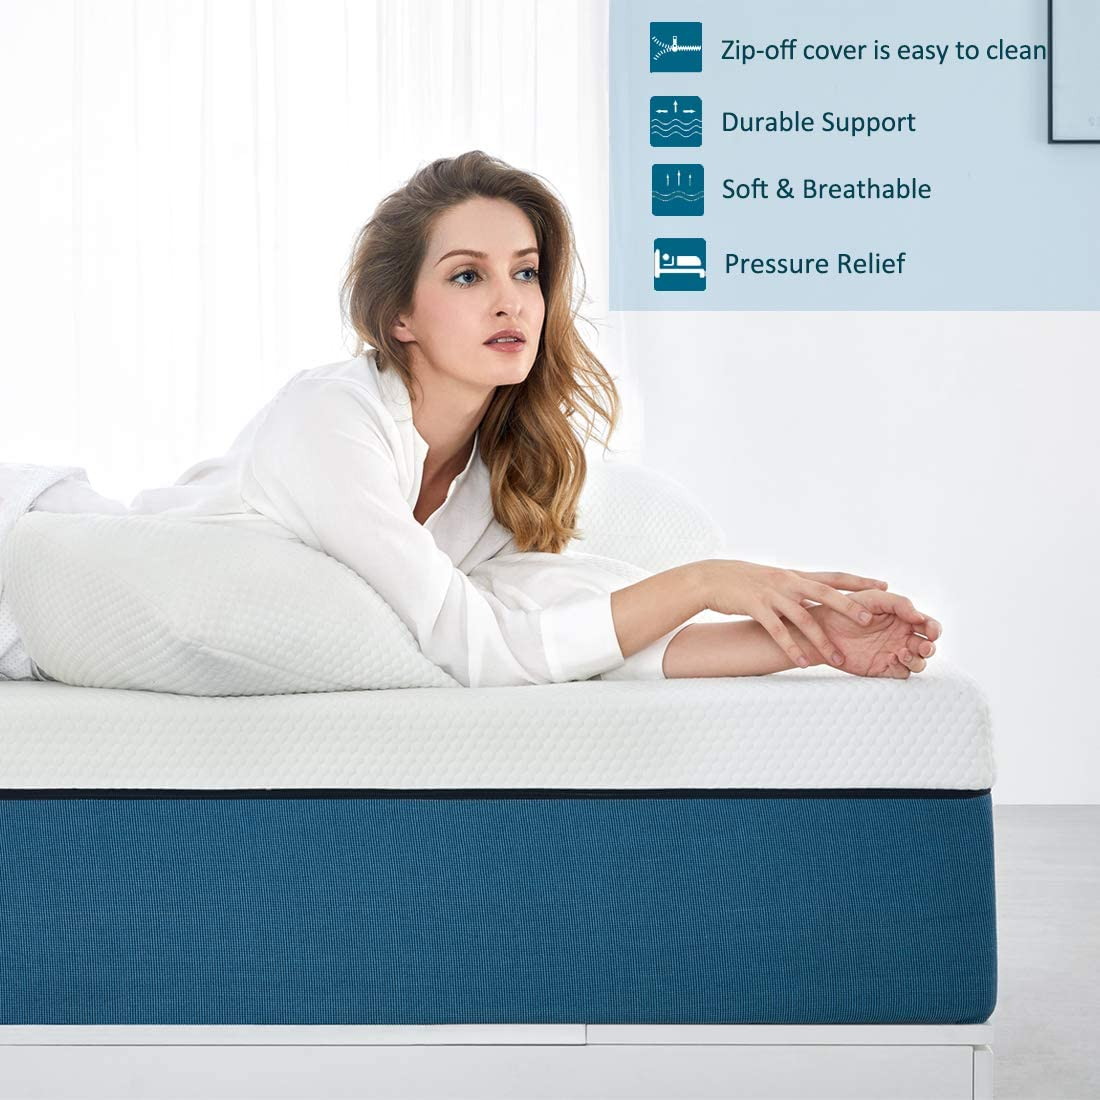 Memory Foam Mattress,Breathable Mattress Medium Firm with Soft Fabric Fire Resistant Barrier Skin-friendly Durable for Single Bed Single Mattress 90x190x18cm Molblly Single Mattress